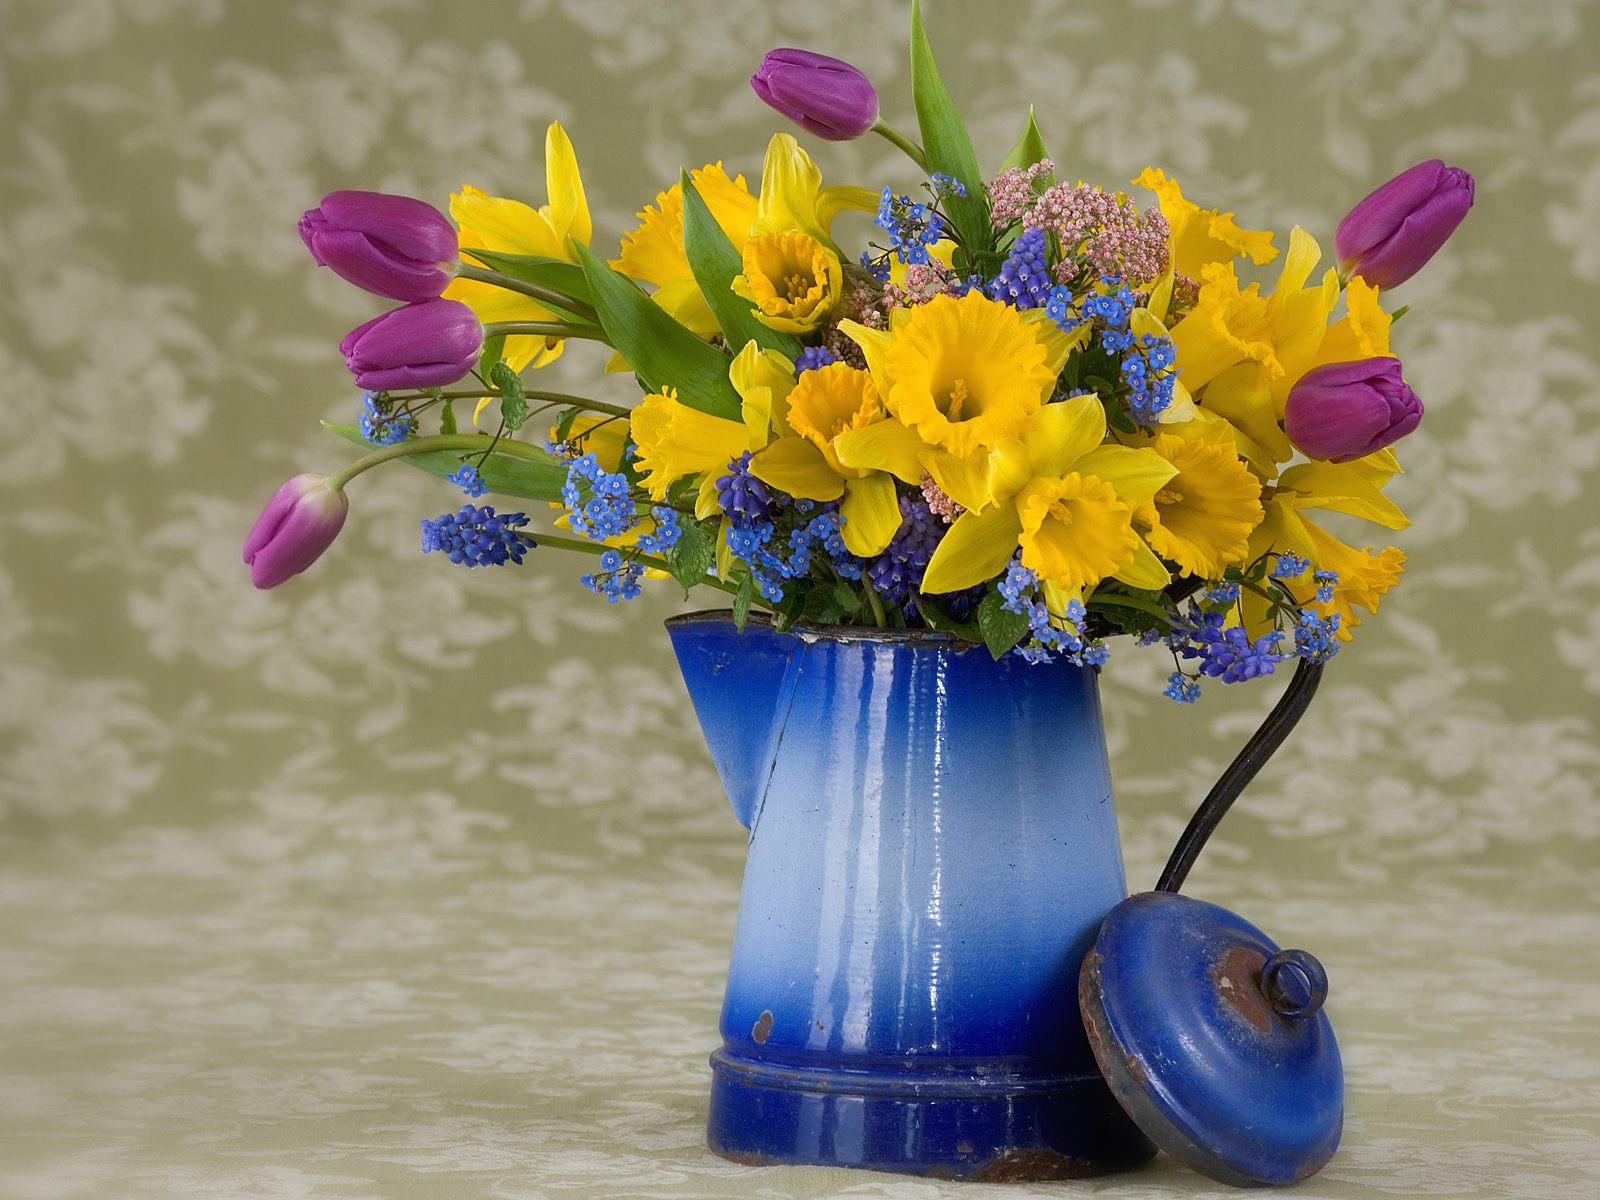 HD Flower Wallpaper Spring Flowers Wallpaper 1600x1200